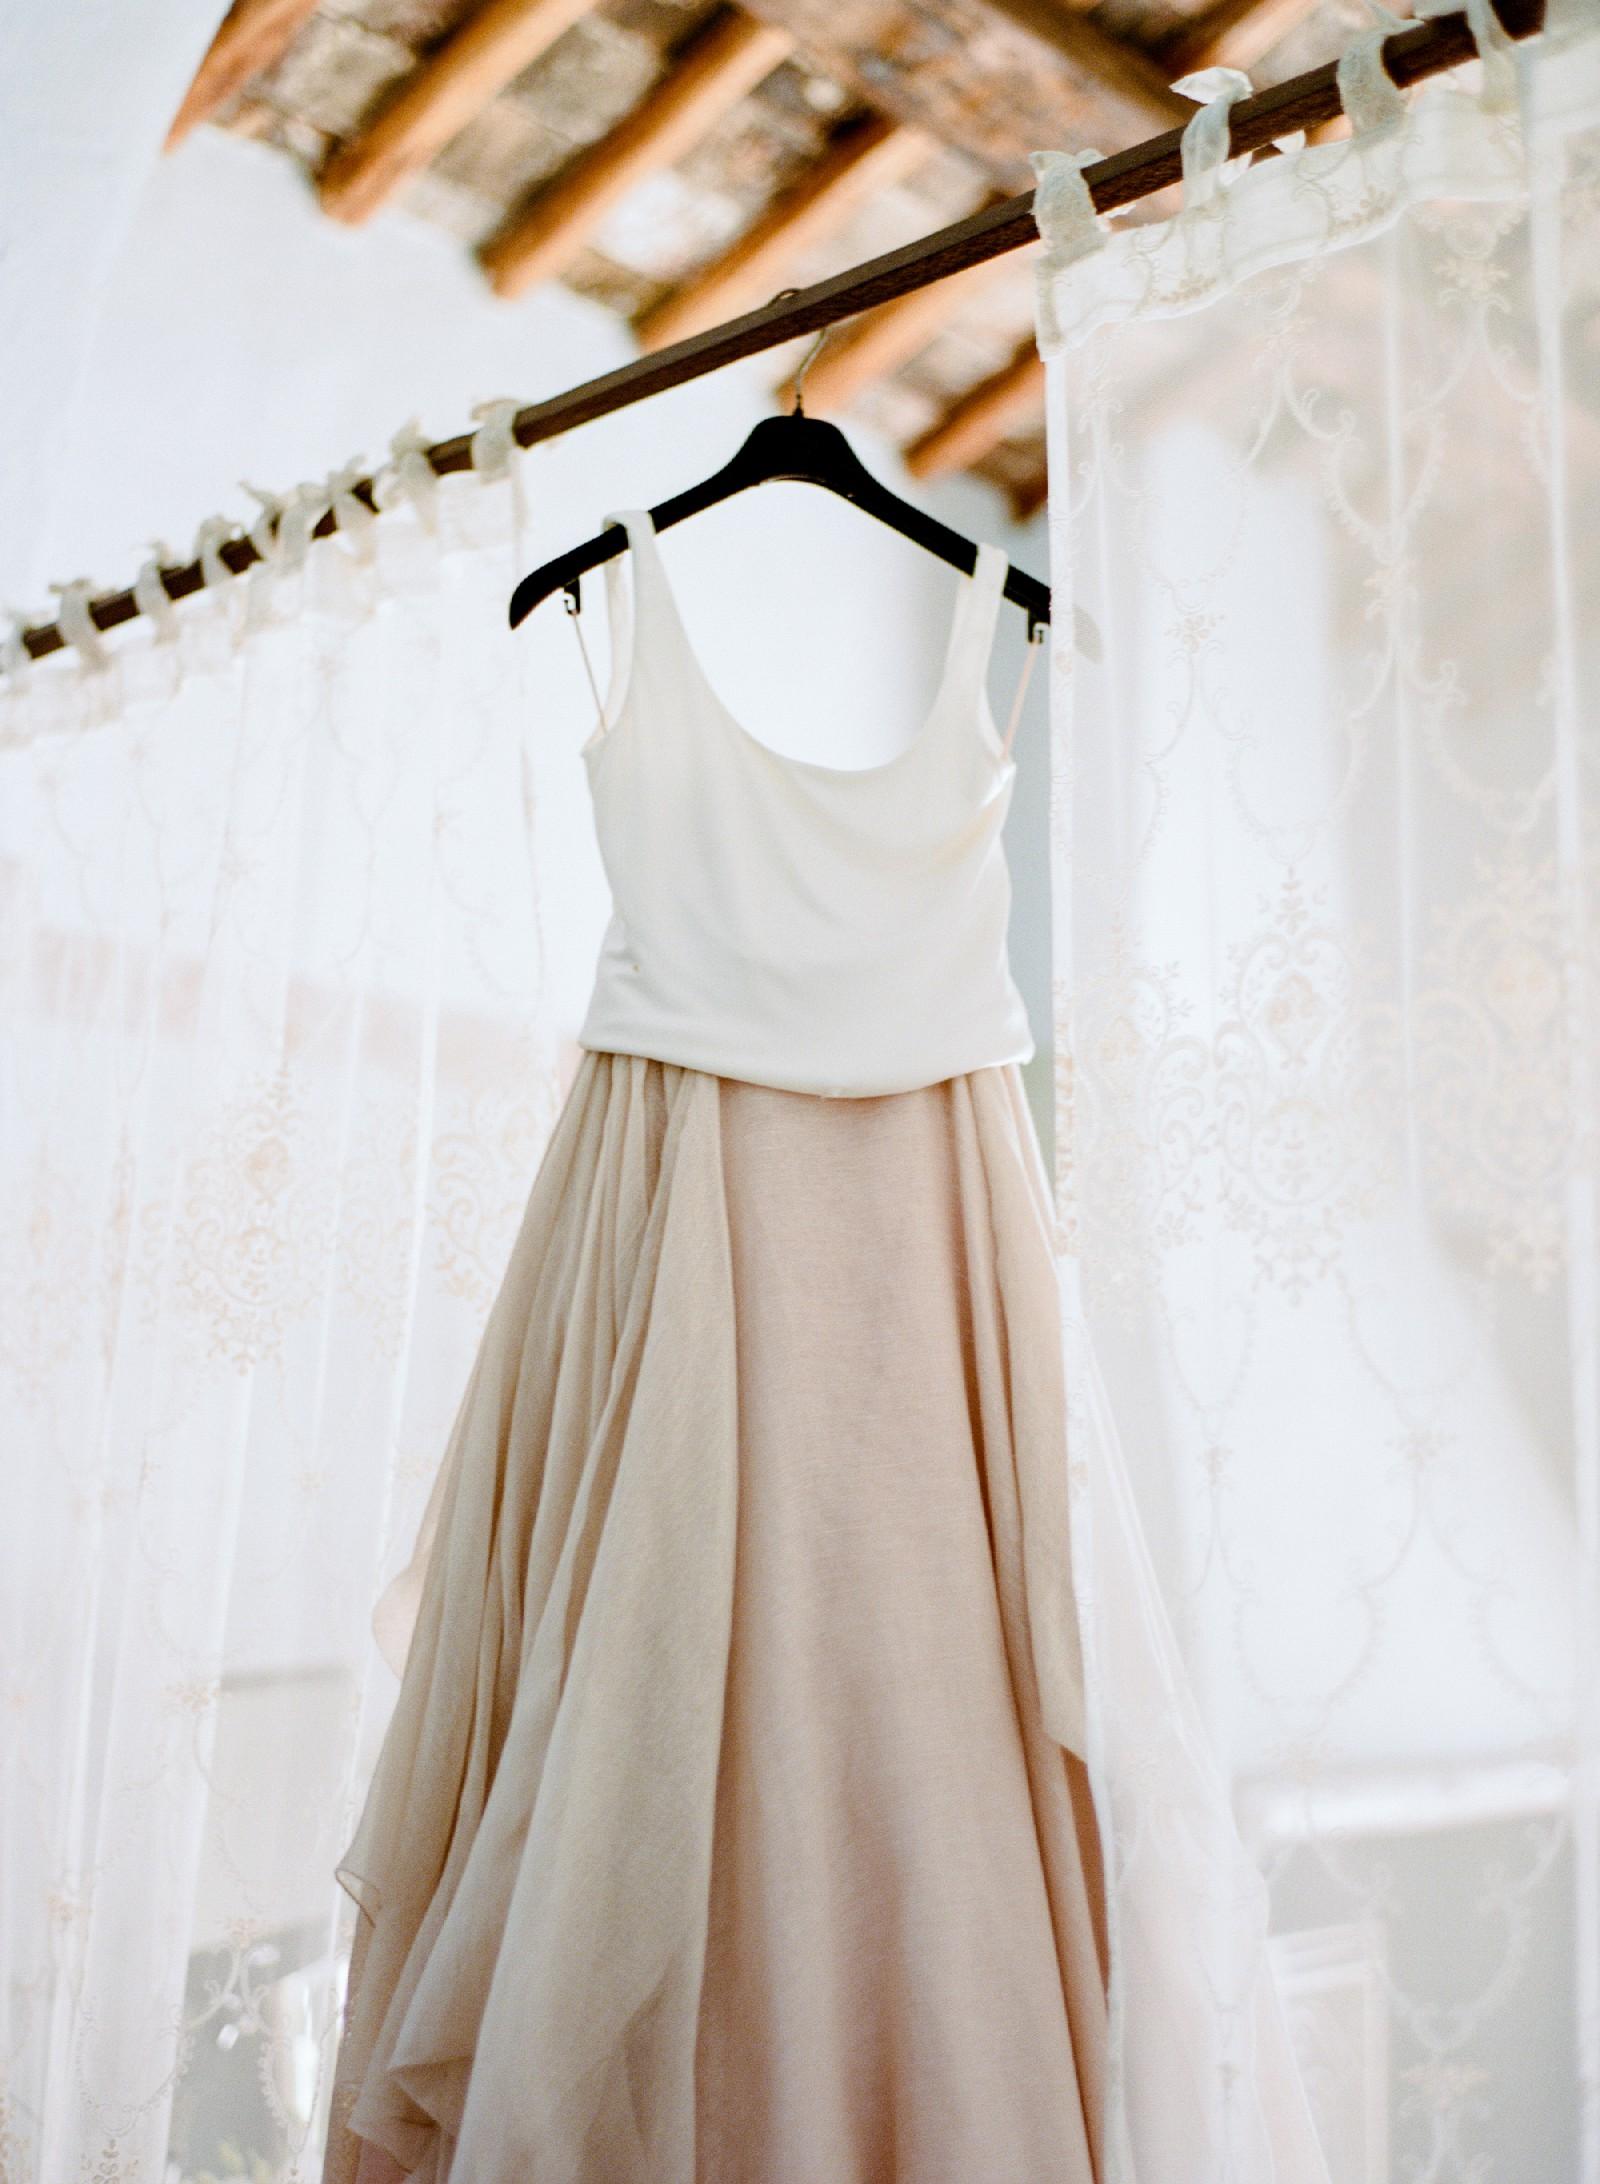 Carol hannah kensington second hand wedding dress on sale for Second hand wedding dresses london